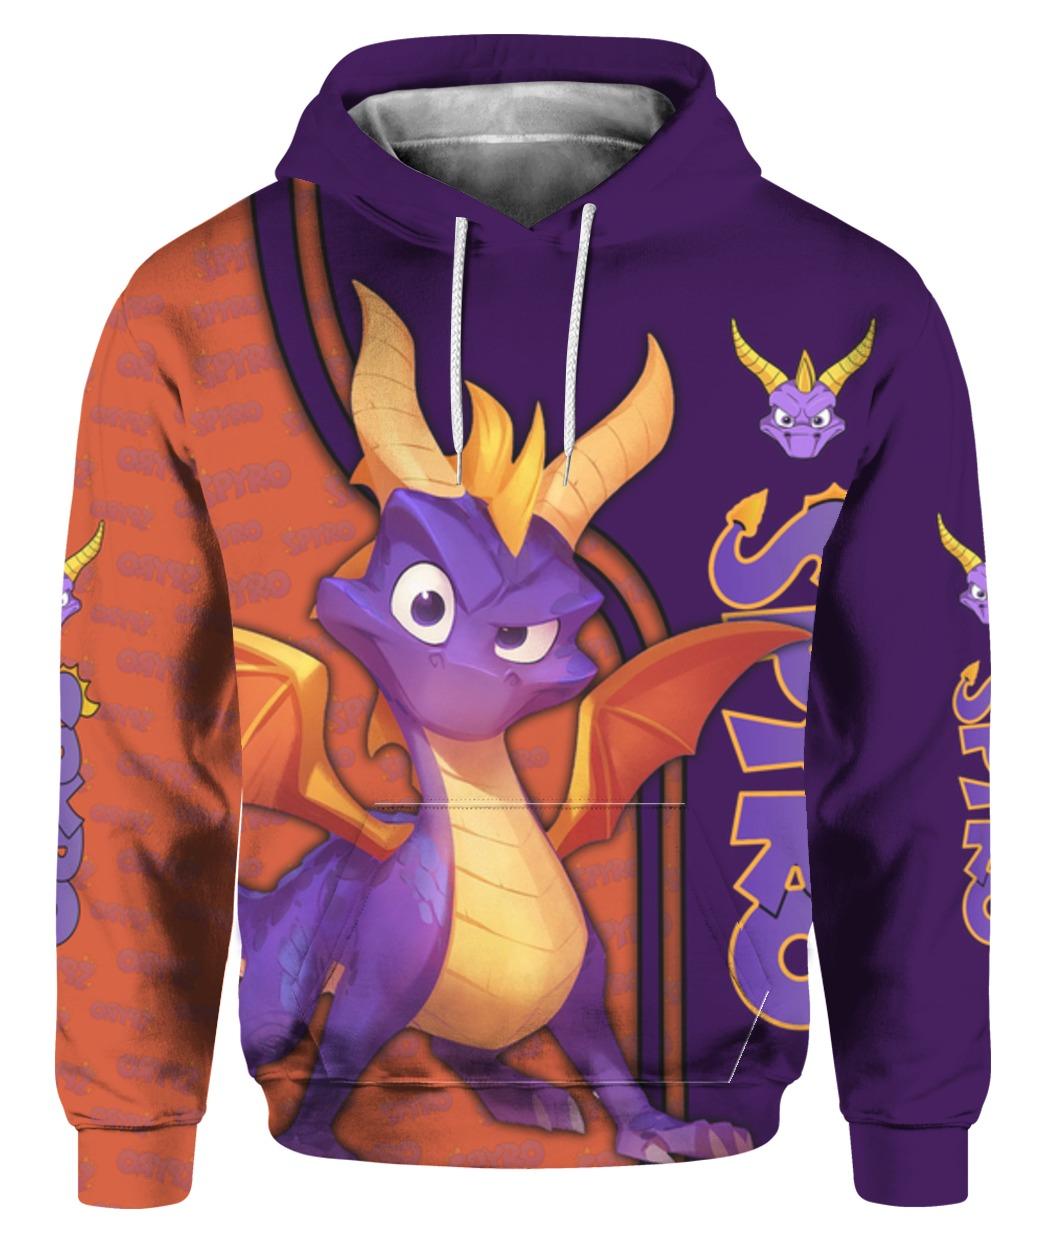 Spyro all over printed hoodie